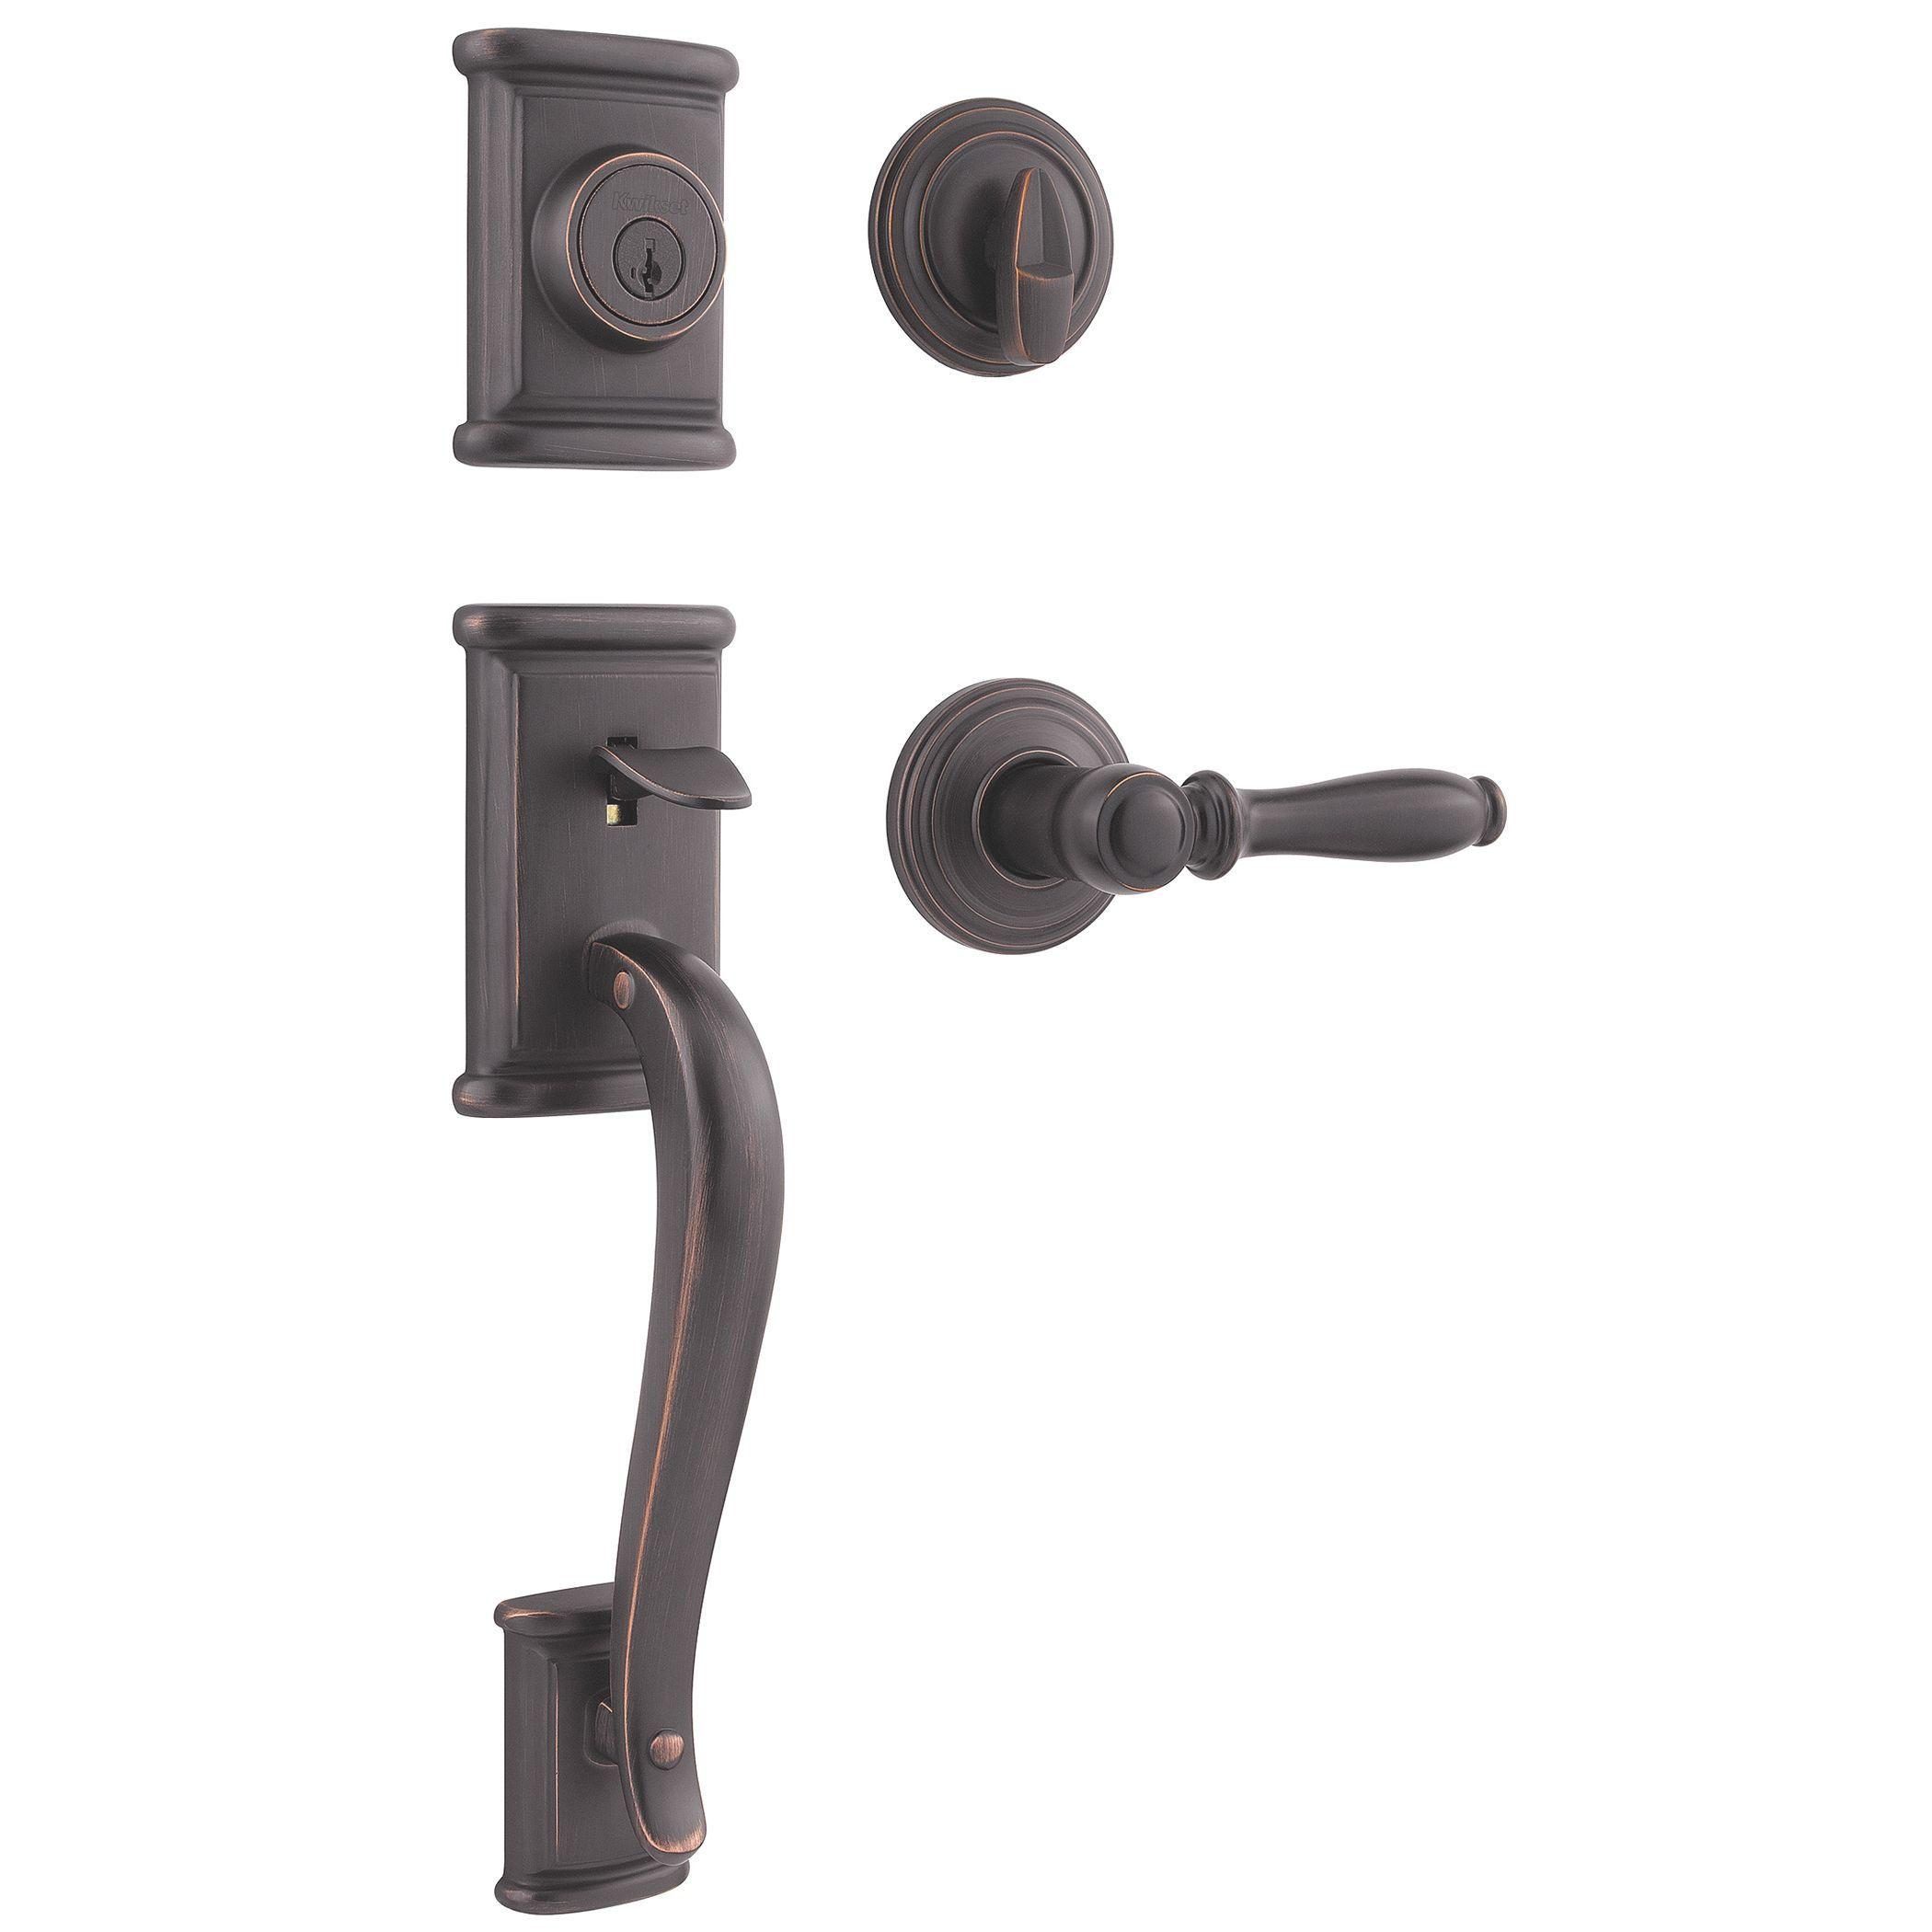 entry doors lock review time door kevo smart kwikset key bluetooth